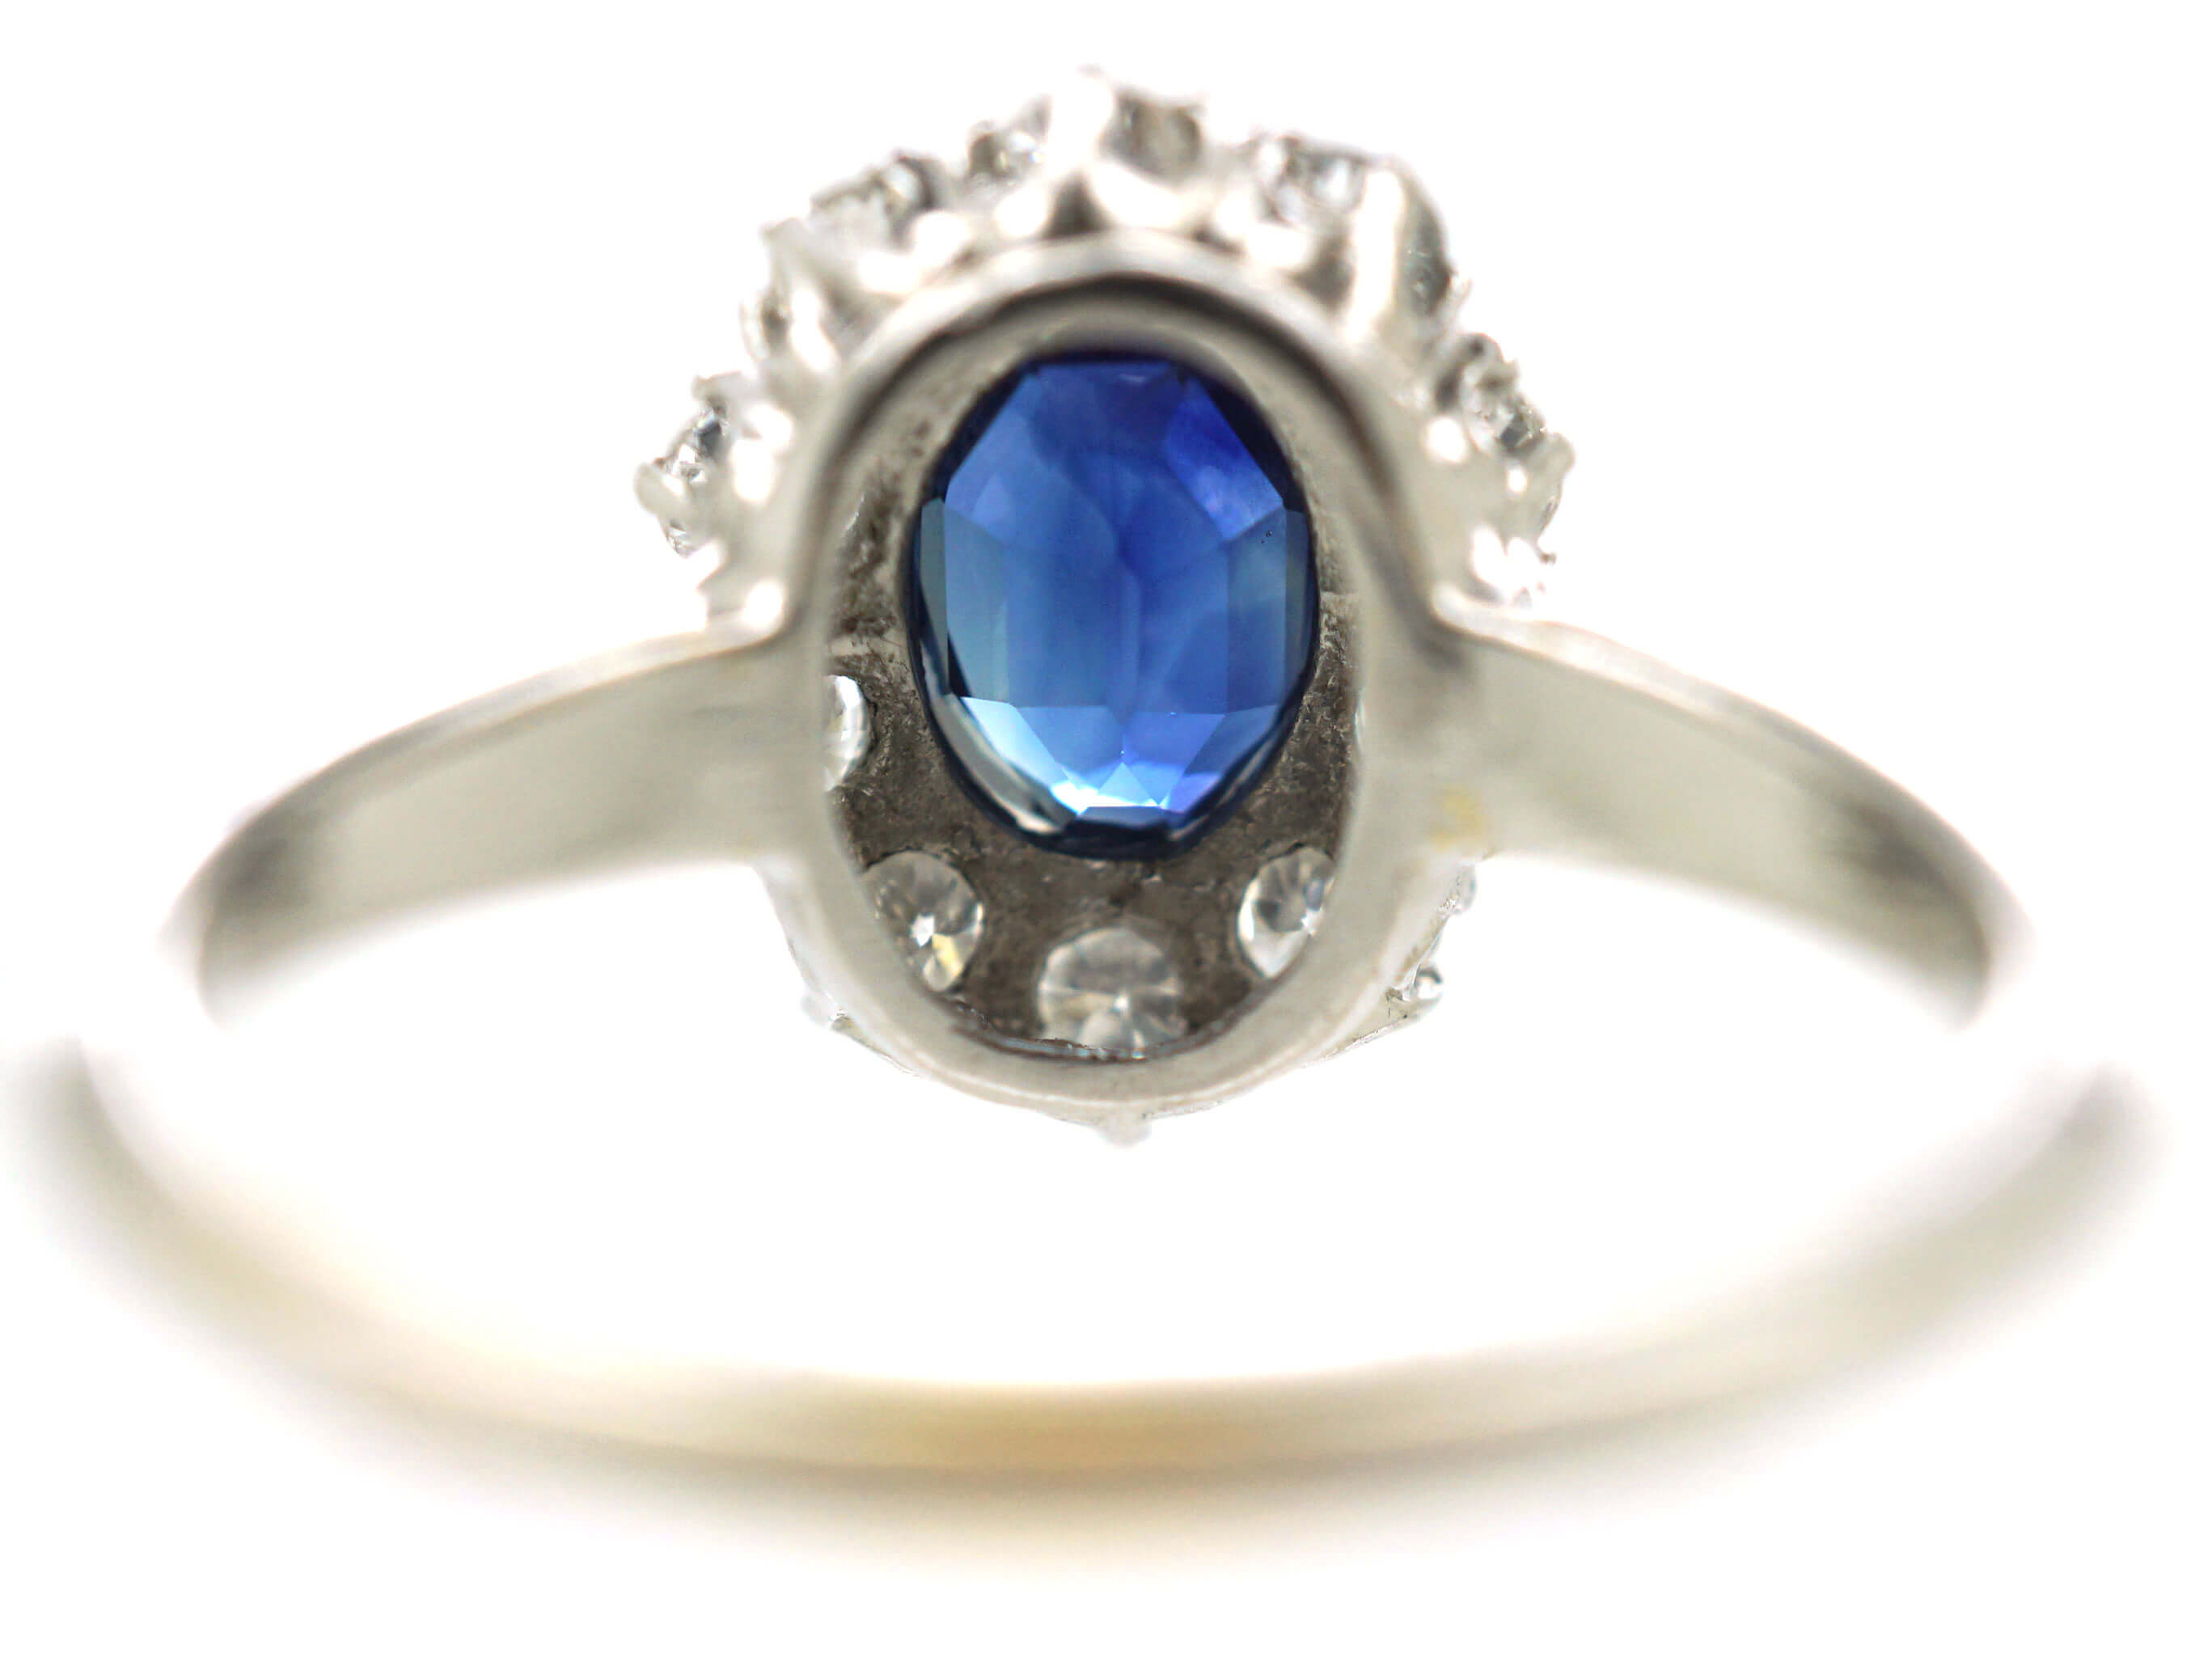 18ct White Gold & Platinum, Sapphire & Diamond Oval Cluster Ring